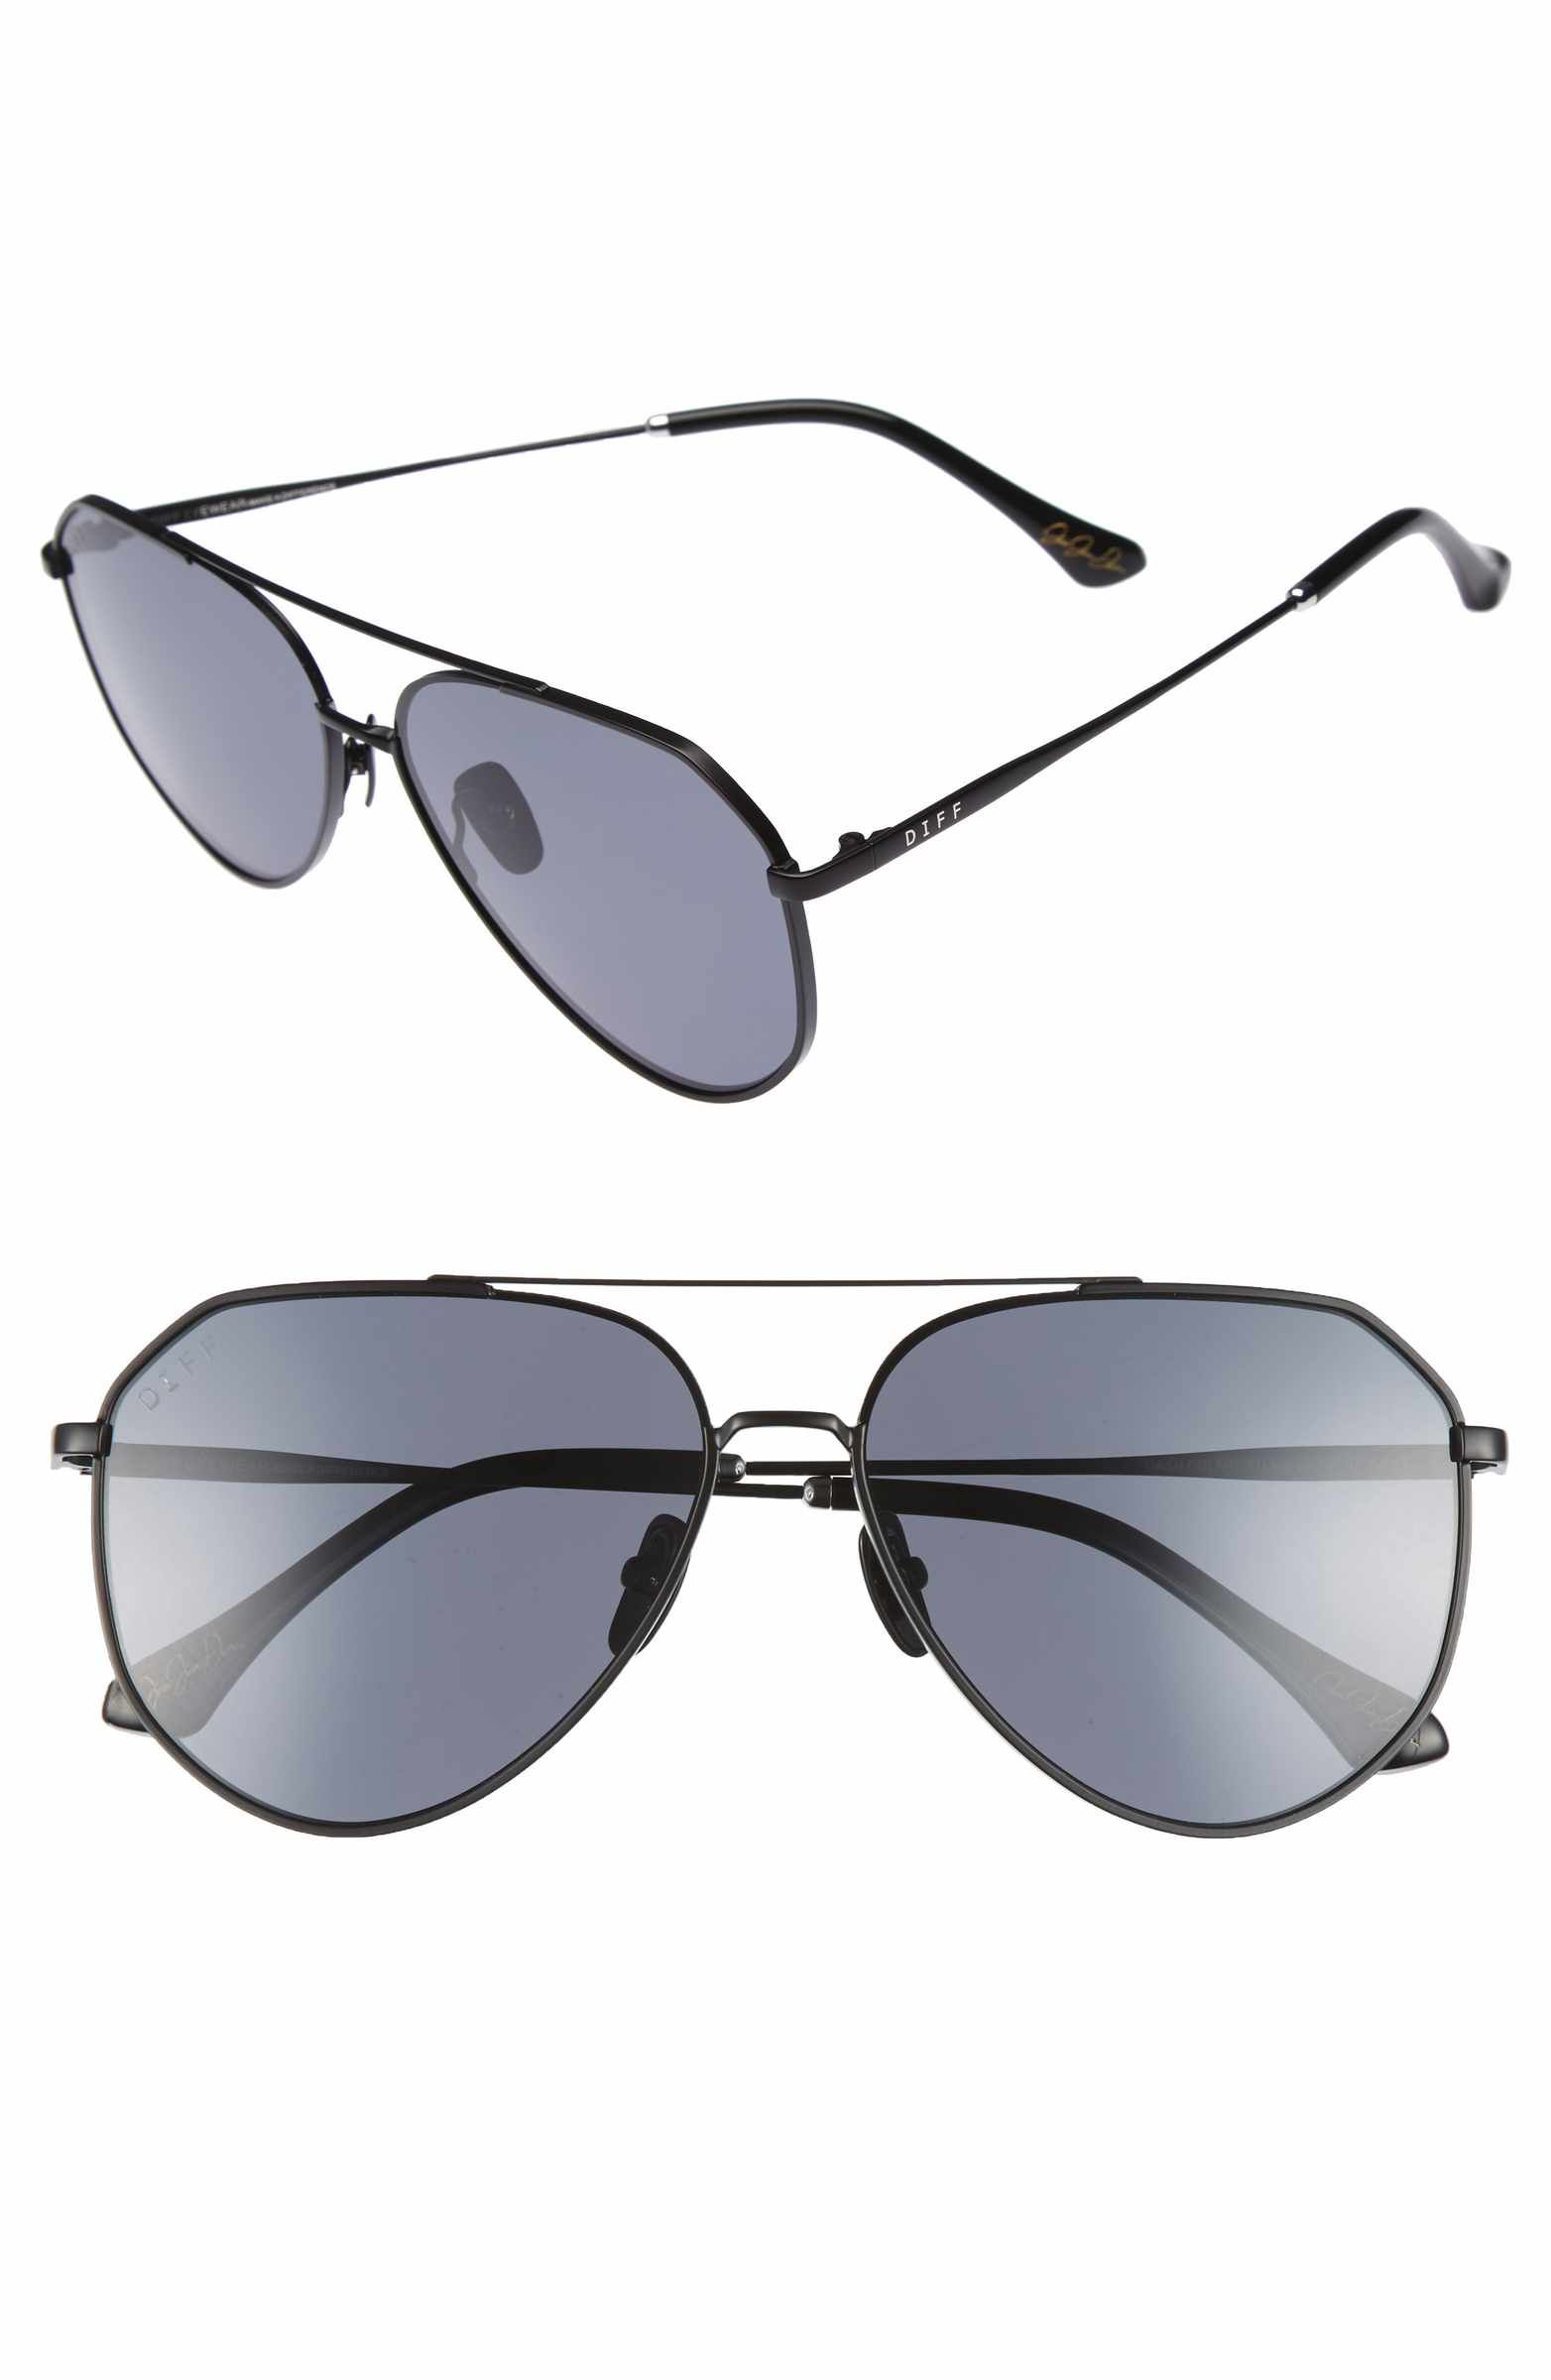 f9c1c9ff3f6d5 DIFF x Jessie James Decker Dash 61mm Polarized Aviator Sunglasses